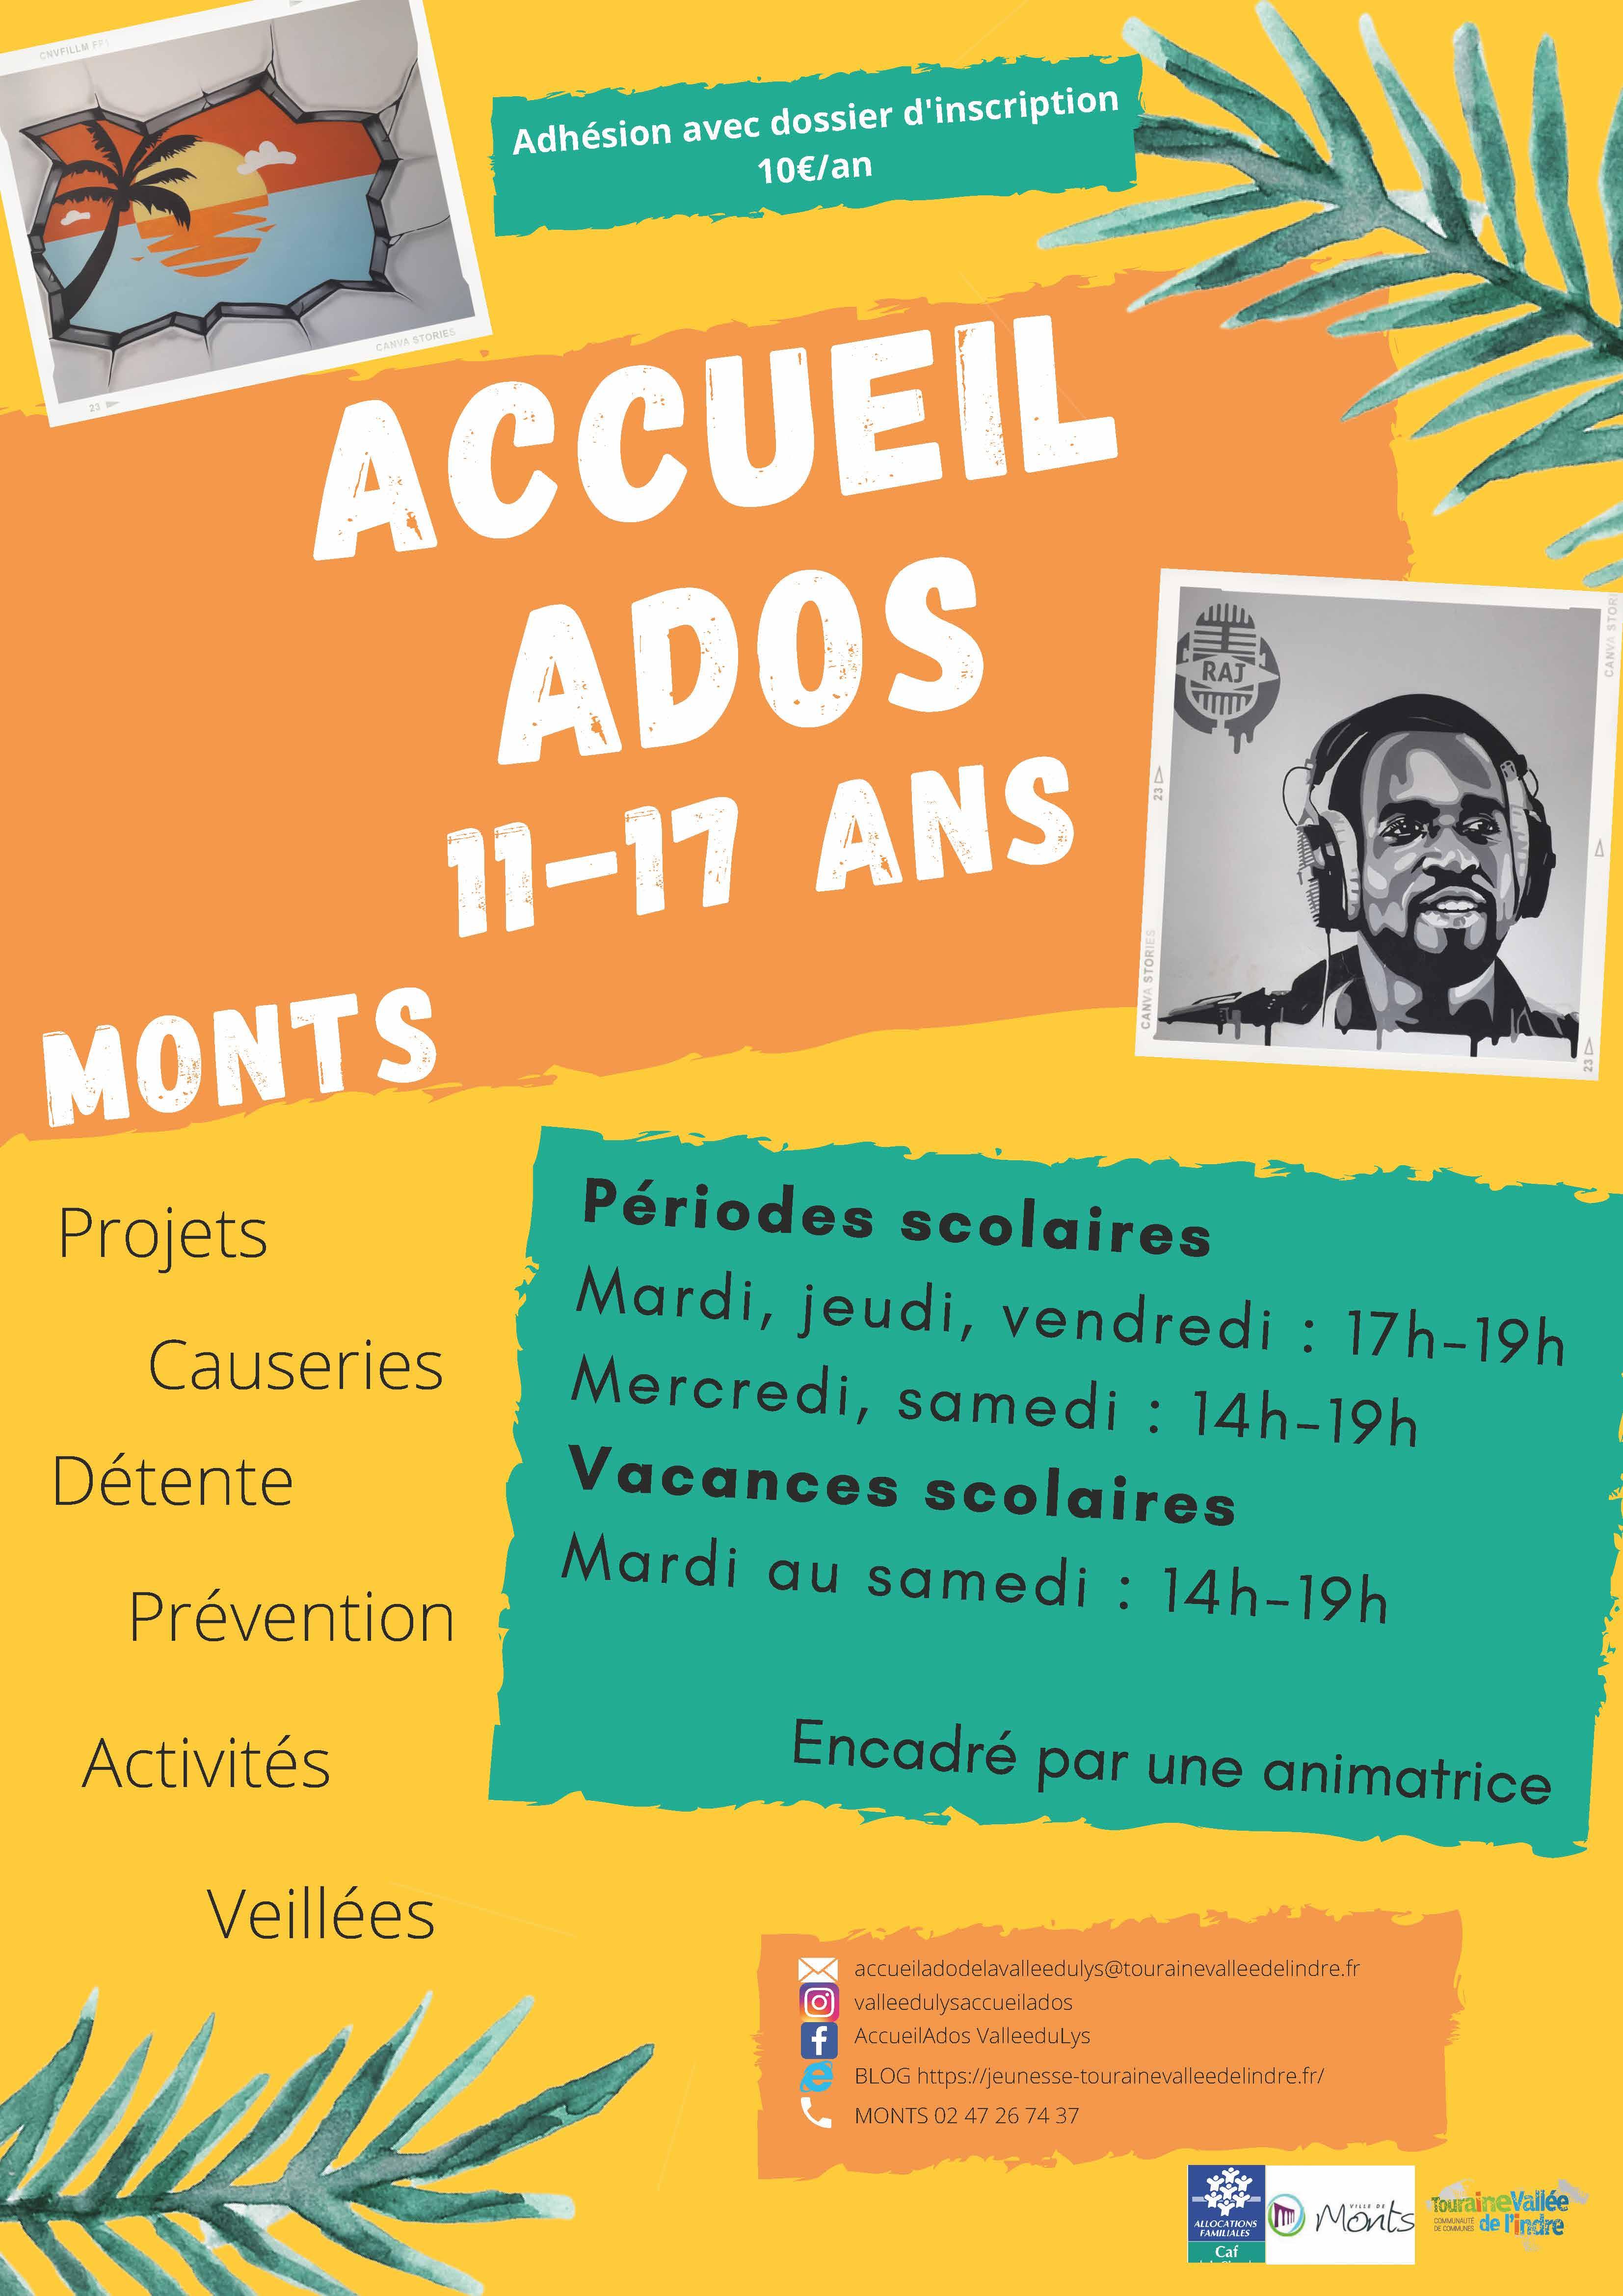 accueil ados Monts.jpg